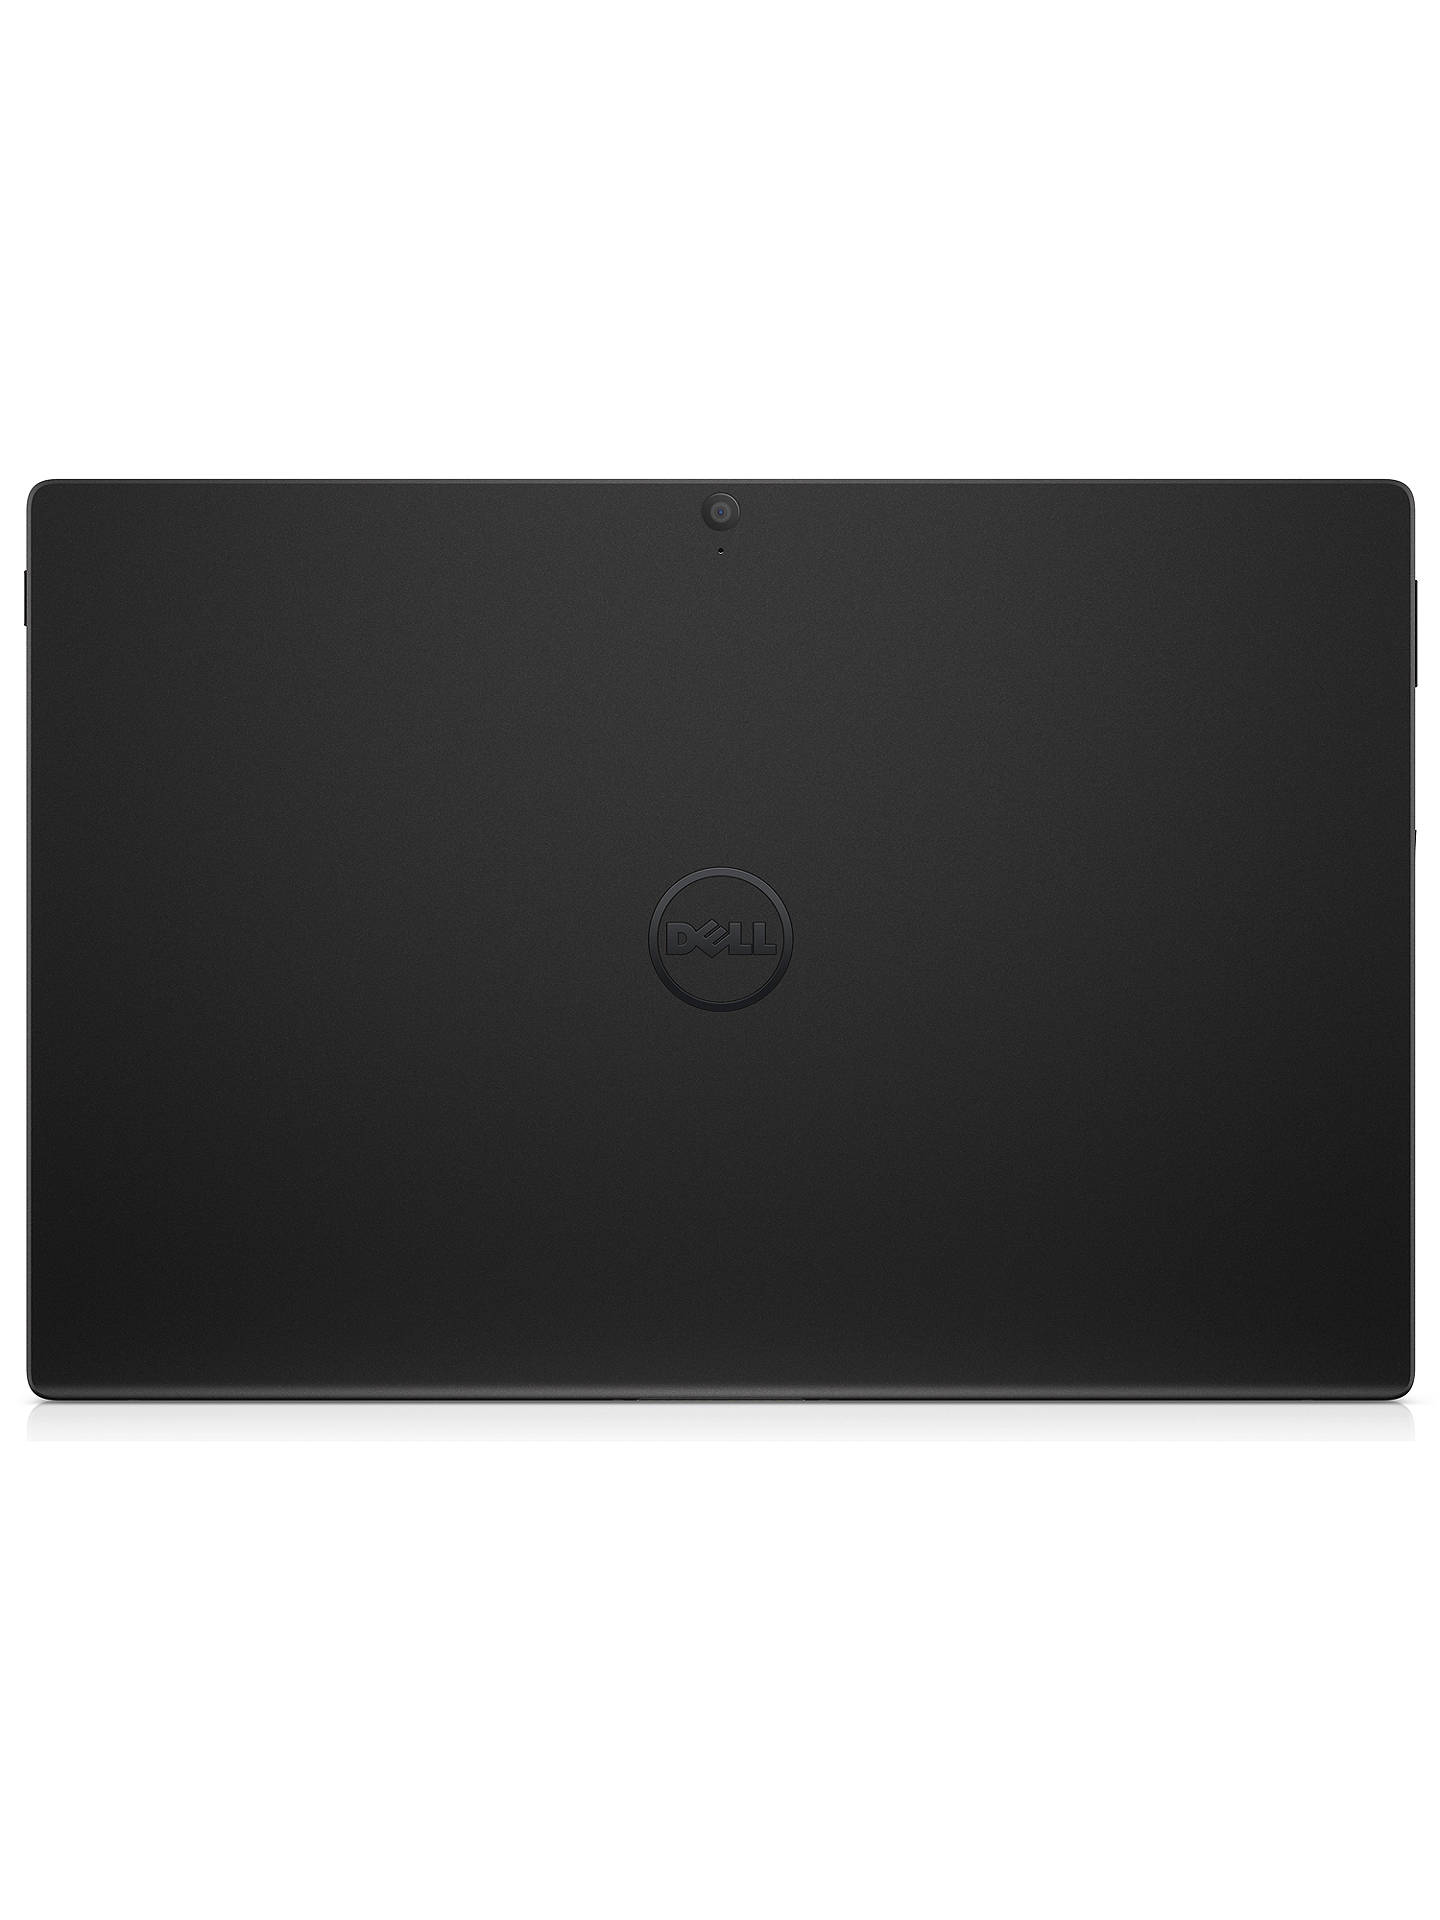 Dell XPS 12-9250 Laptop, Intel Core M3, 128GB SSD, 4GB RAM